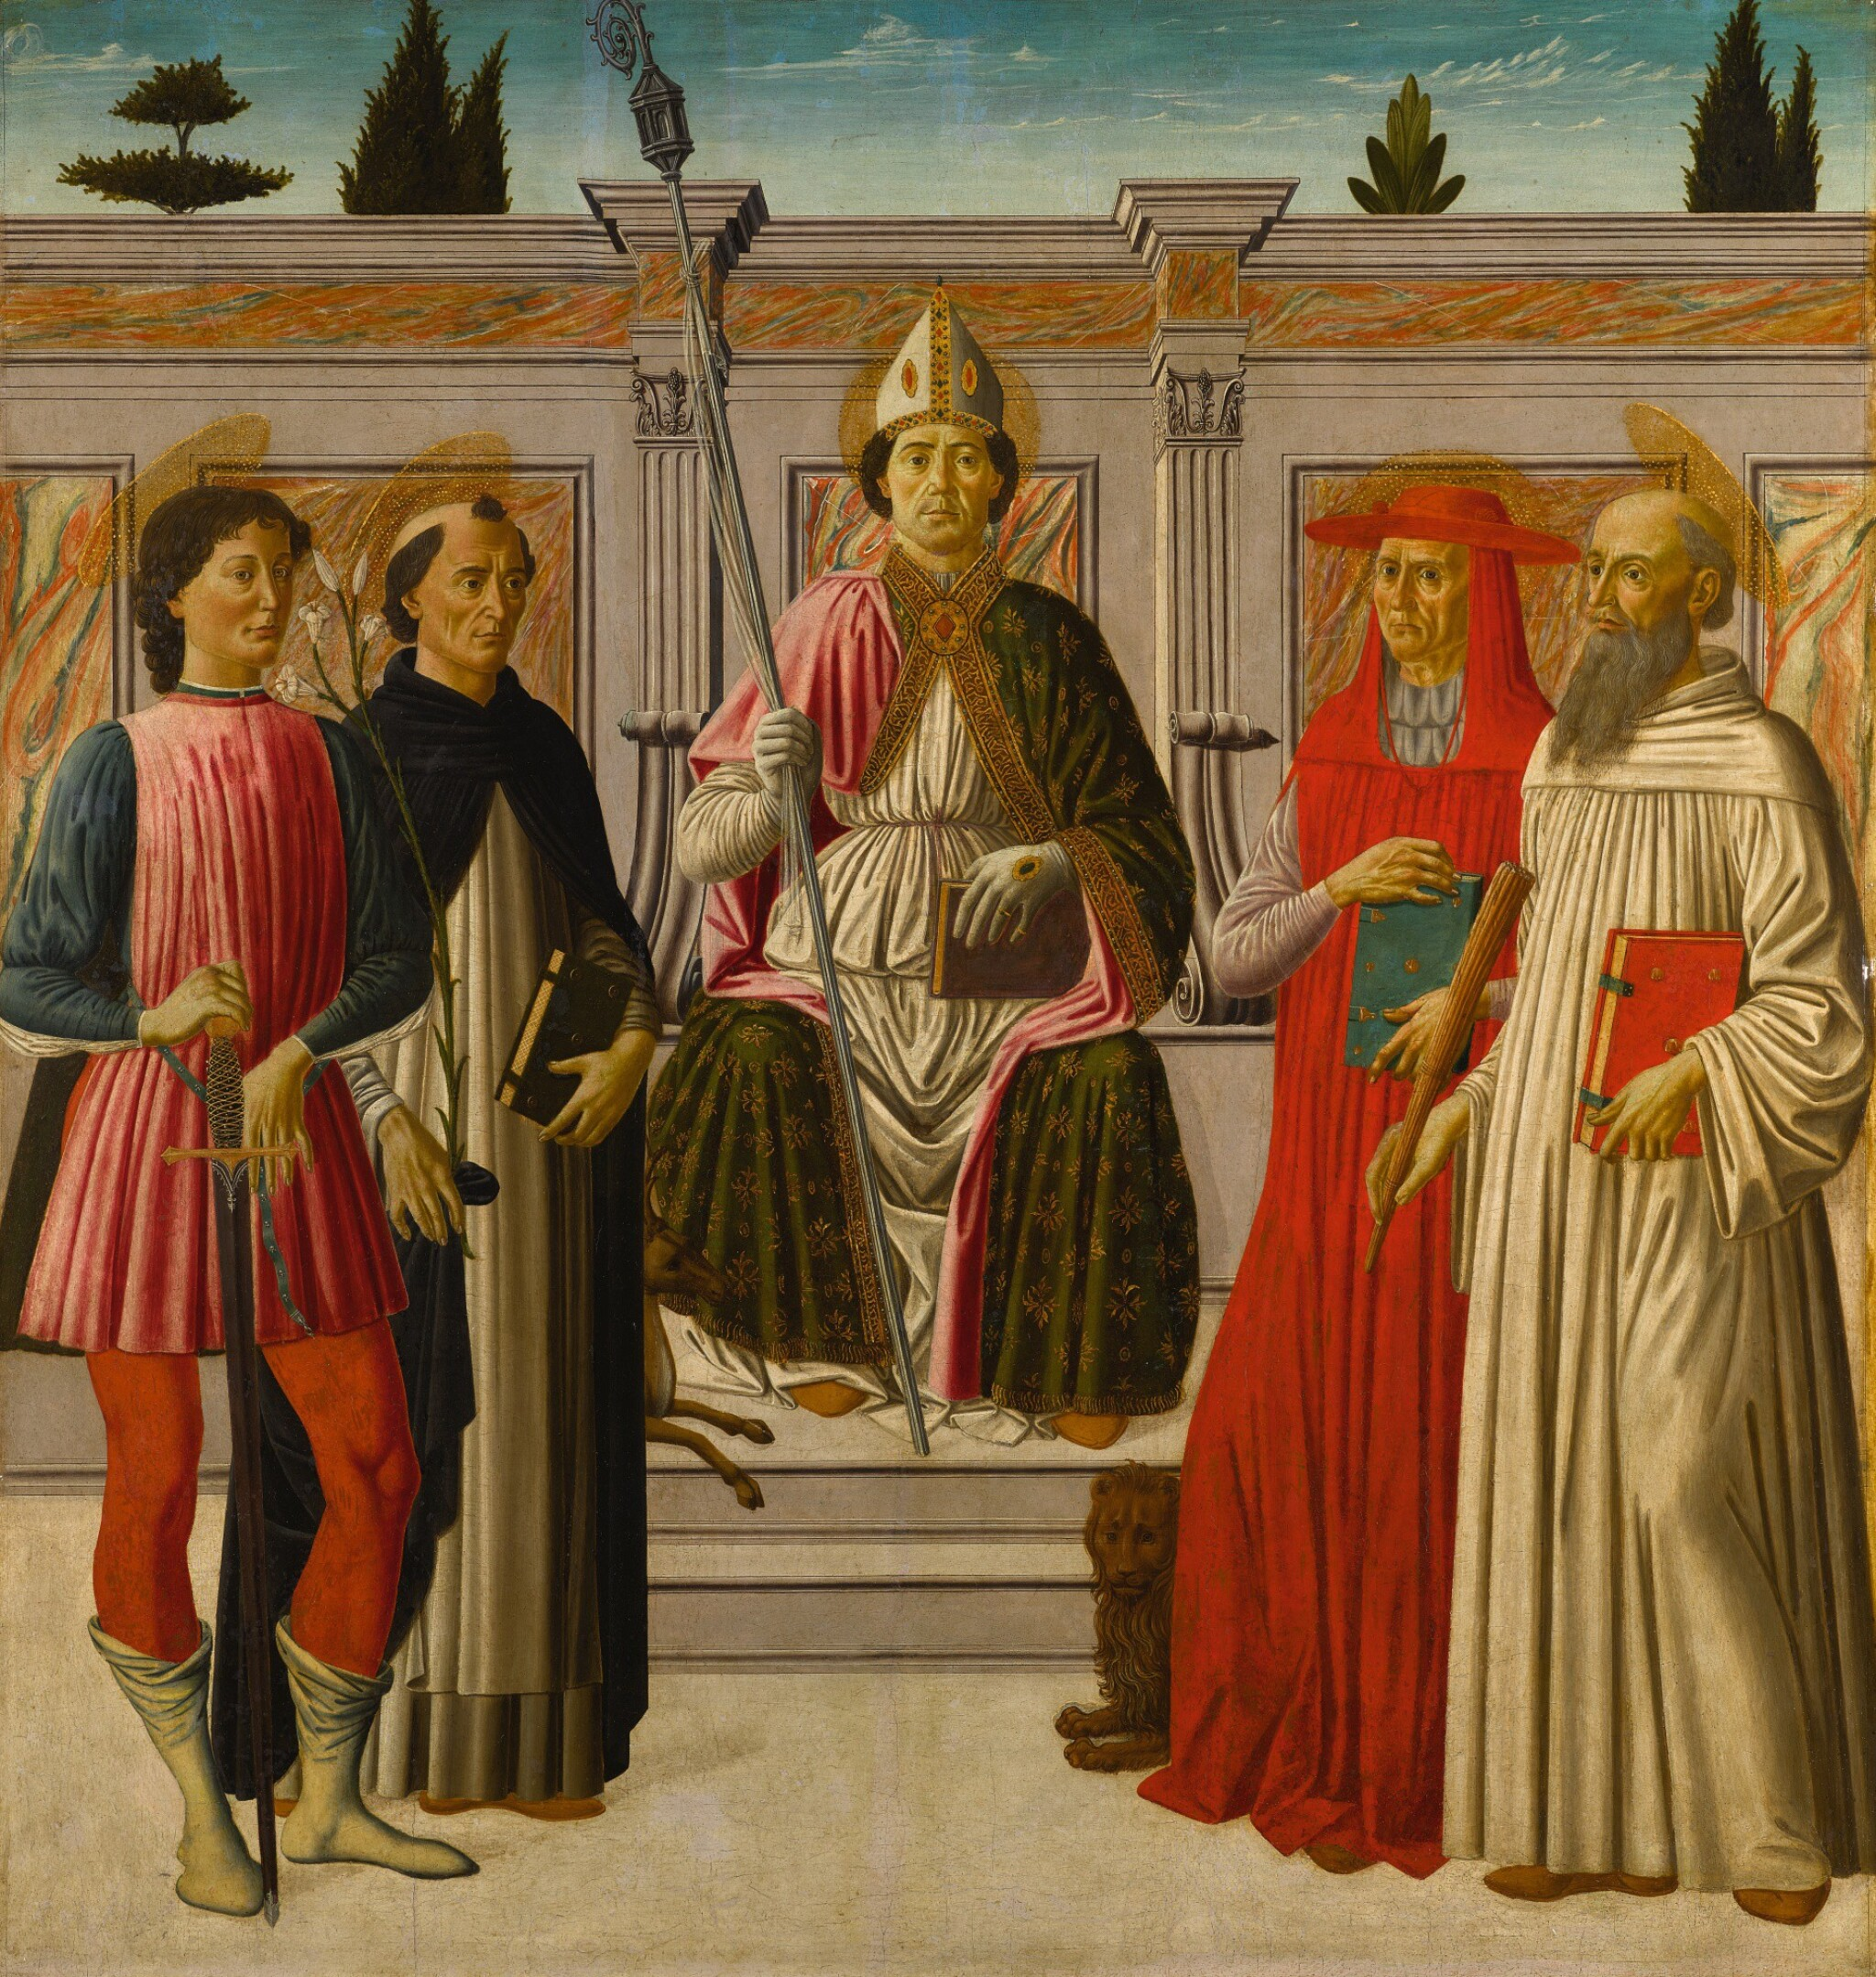 FRANCESCO BOTTICINI | Saint Nicholas enthroned with Saints Hubert, Dominic, Jerome and Anthony of Padua | 弗朗契斯科・波提其尼 |《聖尼格老登位,聖胡伯、聖道明、聖傑羅姆與帕多瓦的聖安東尼在旁》